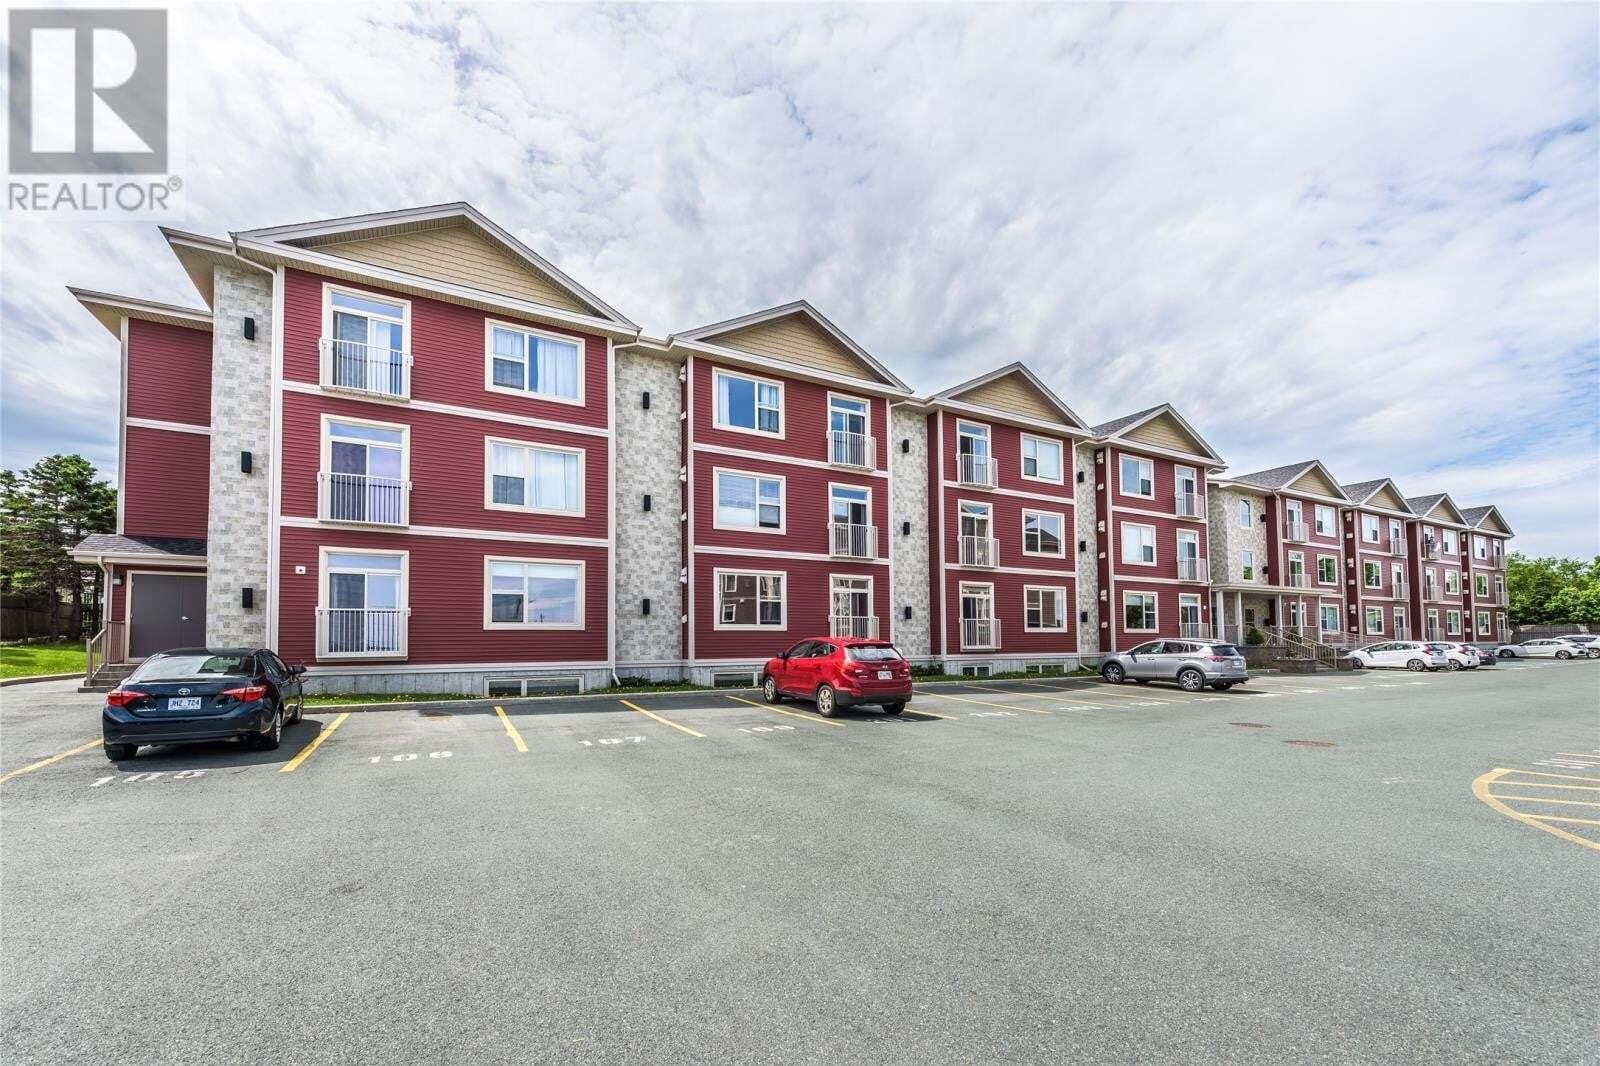 House for sale at 27 Rhodora St St John's Newfoundland - MLS: 1221732